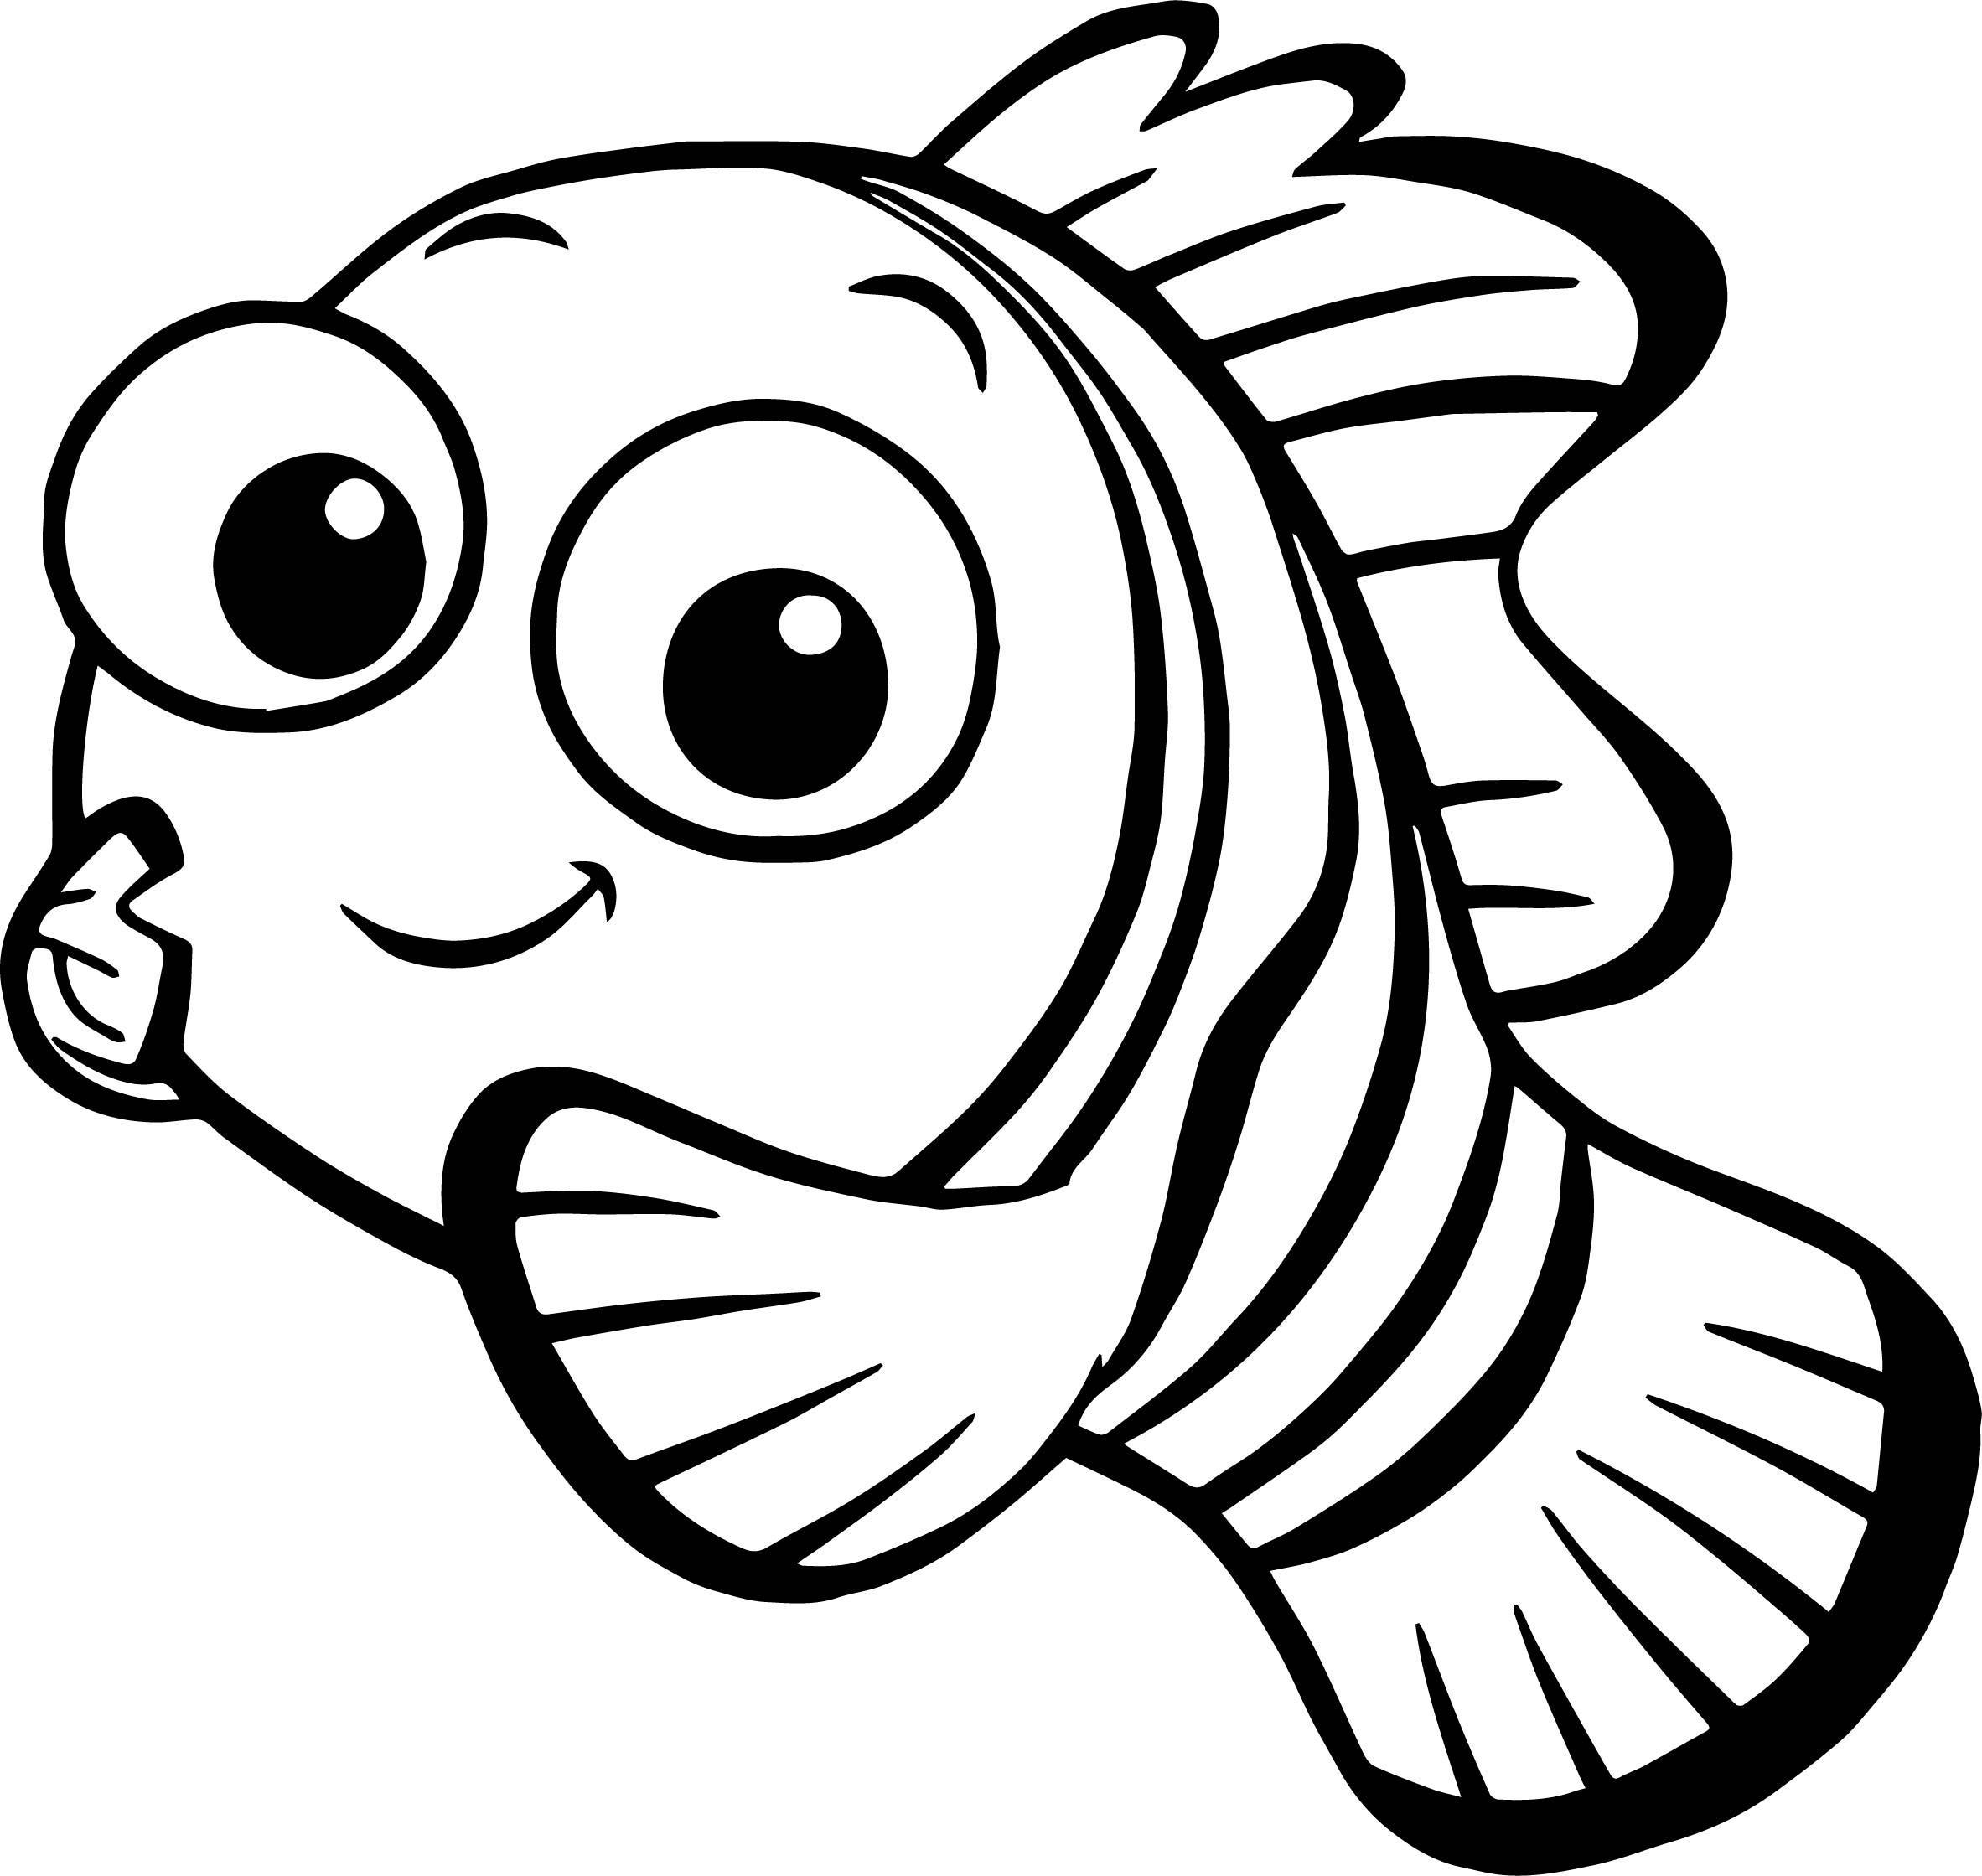 Nemo clipart black and white. Disney finding fish